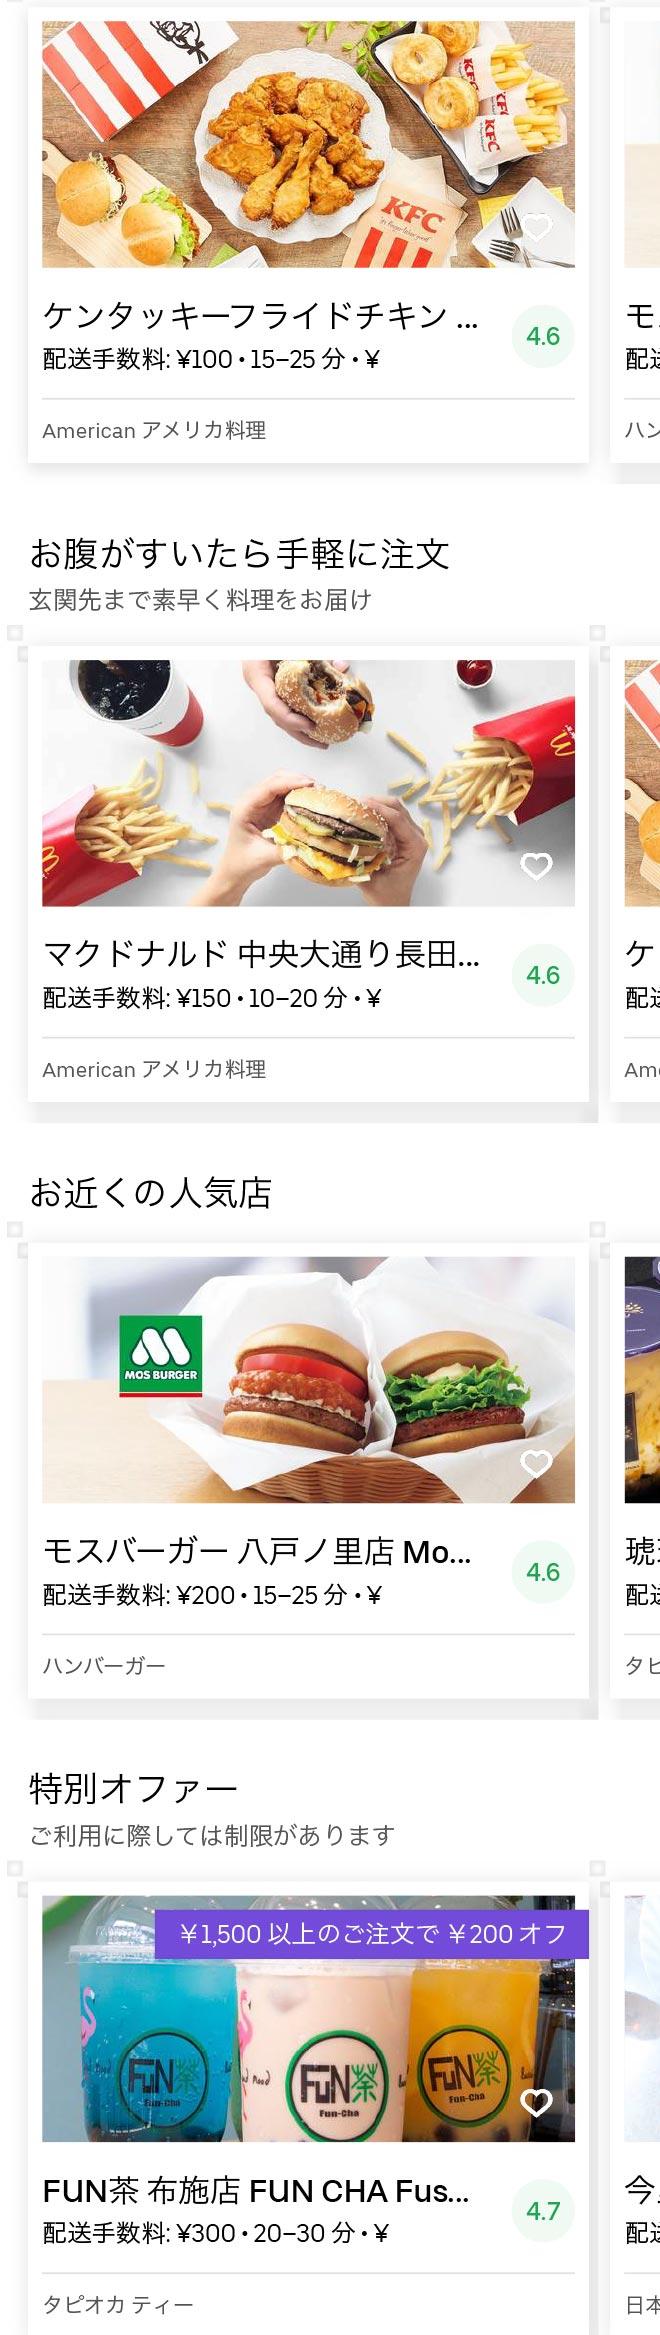 Higashi osaka nagata menu 2005 01